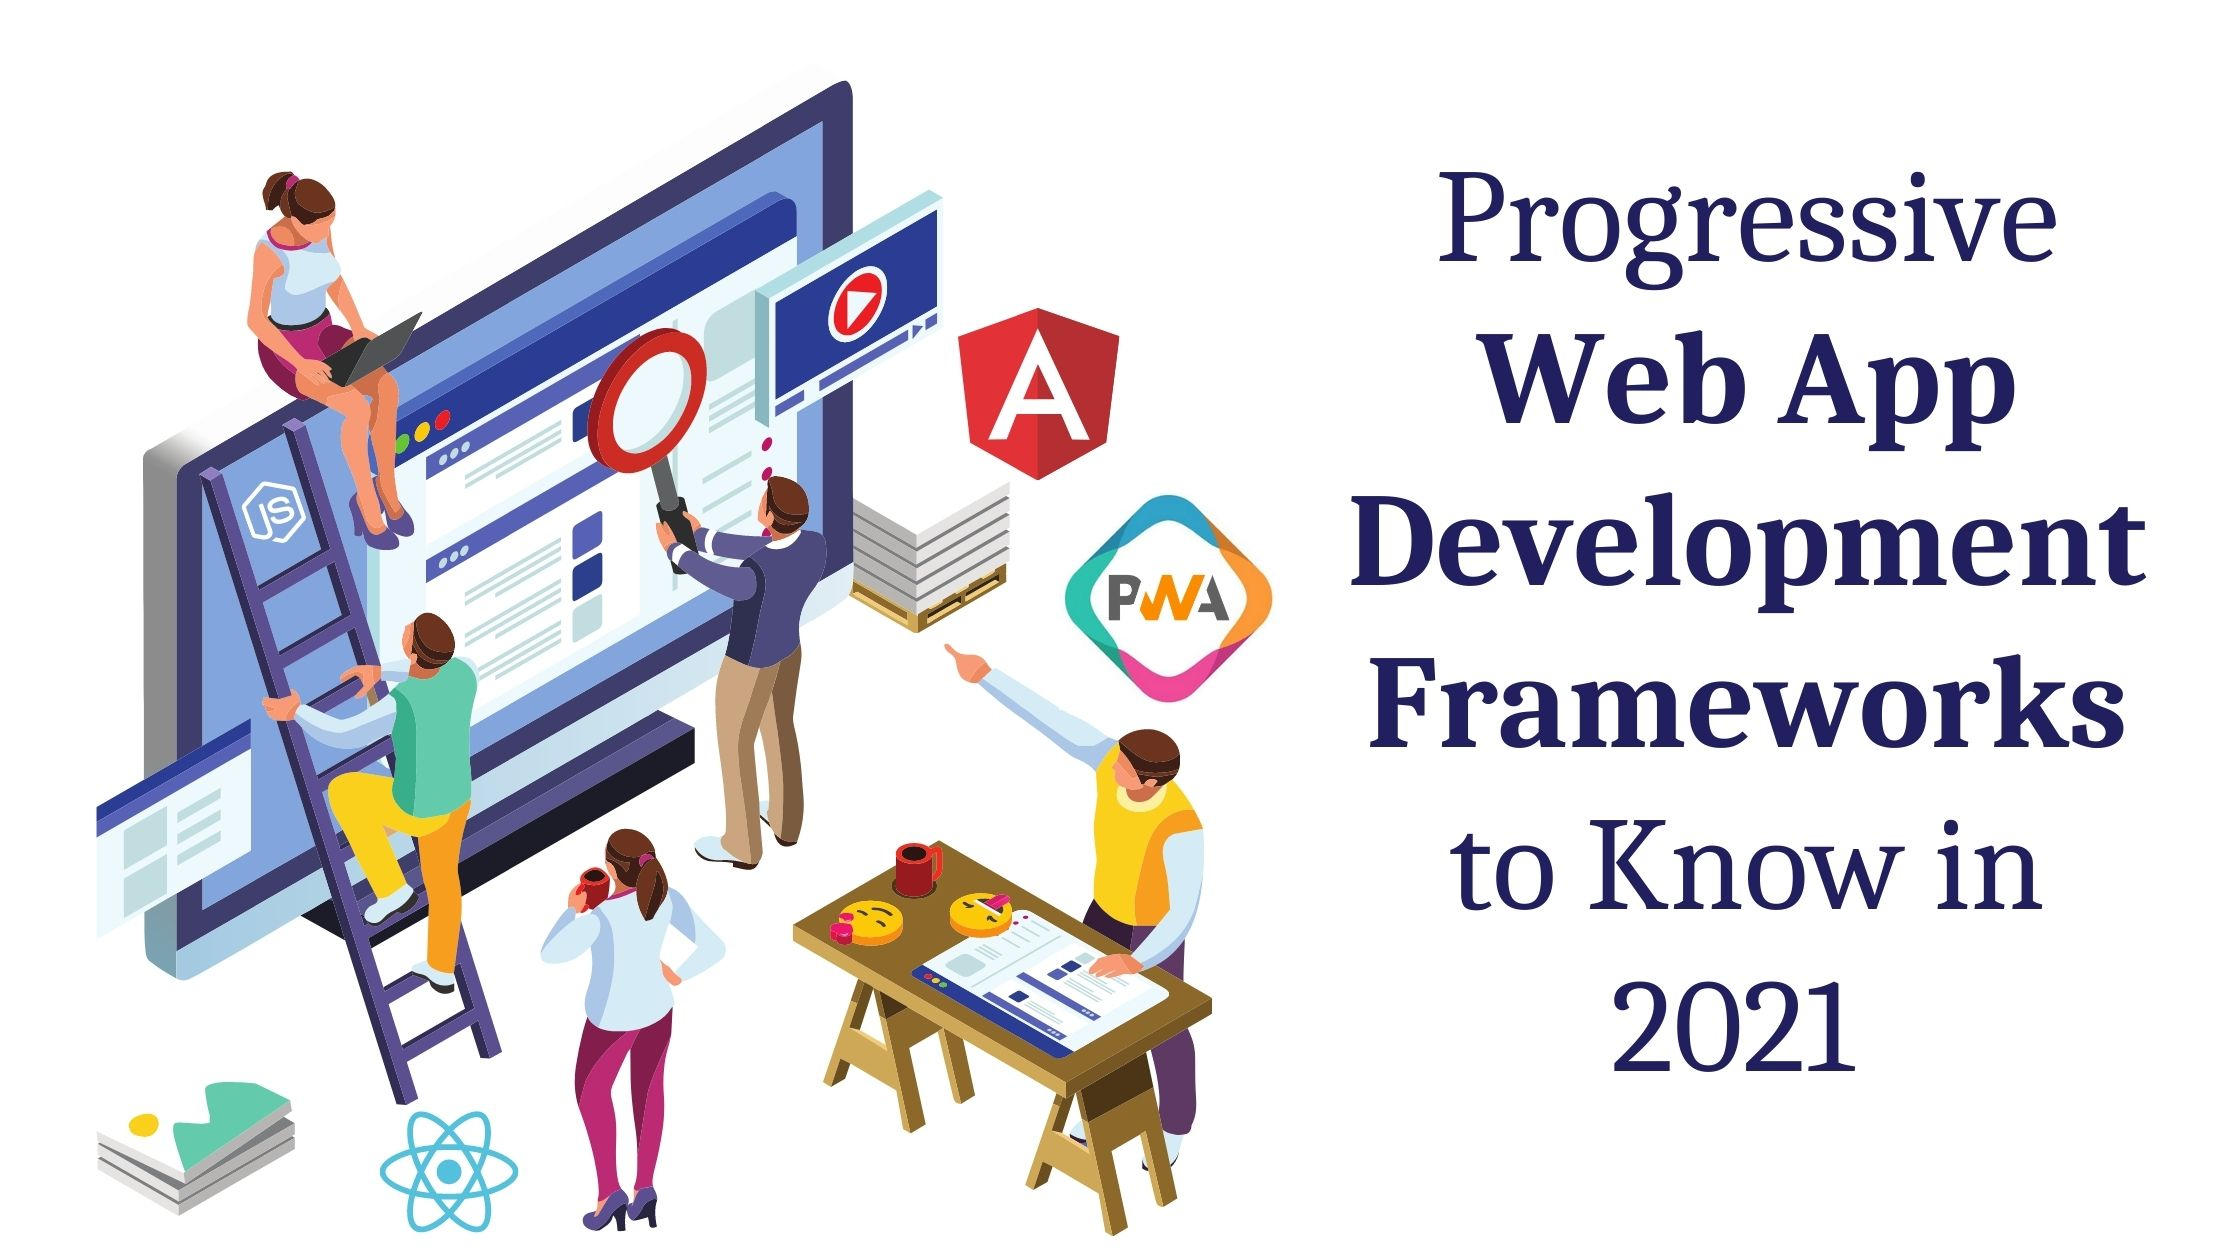 Progressive Web App Frameworks